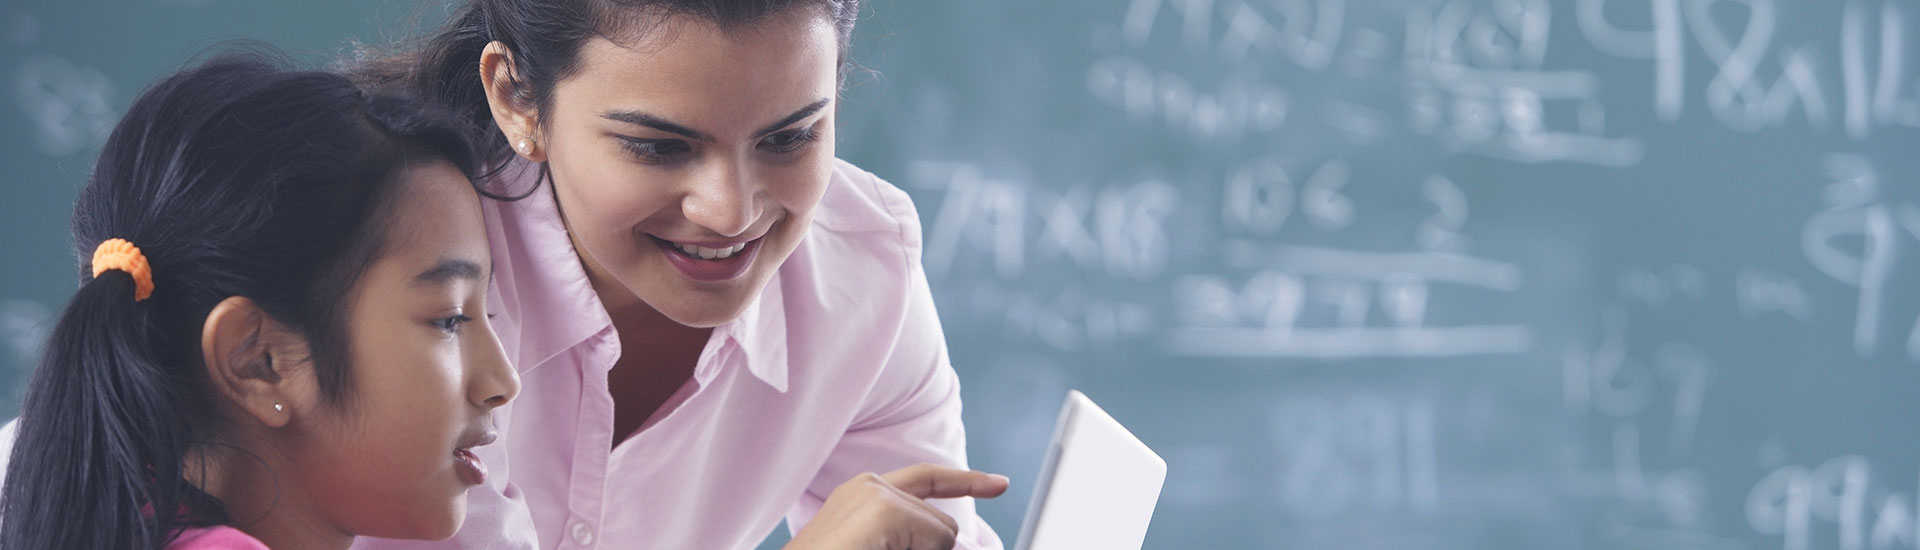 education software edmentum international learning platforms